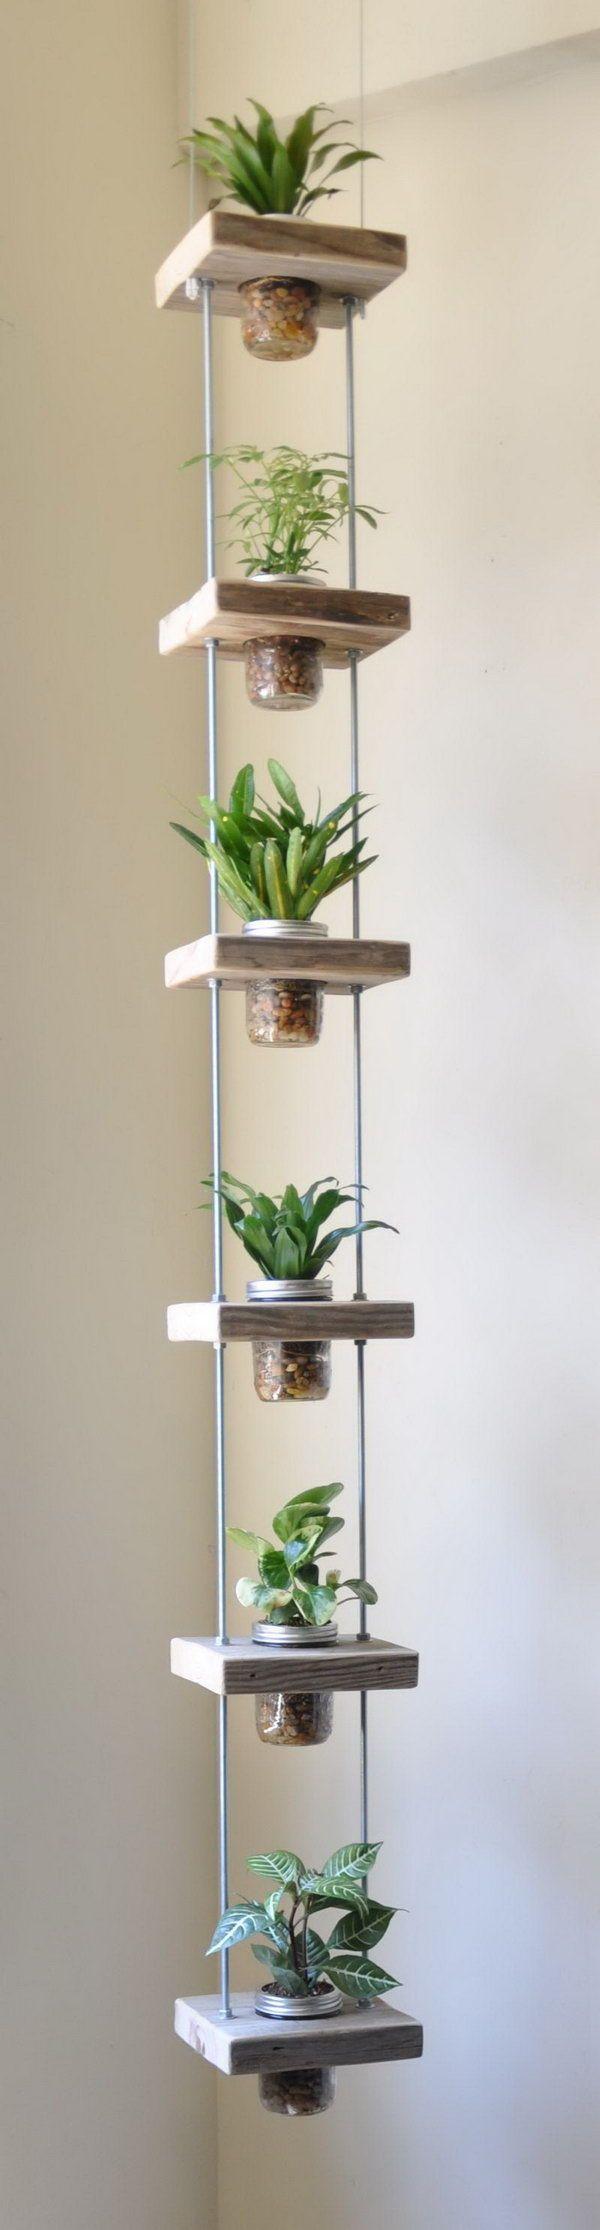 25 Awesome Indoor Garden Herb DIY ideas 5